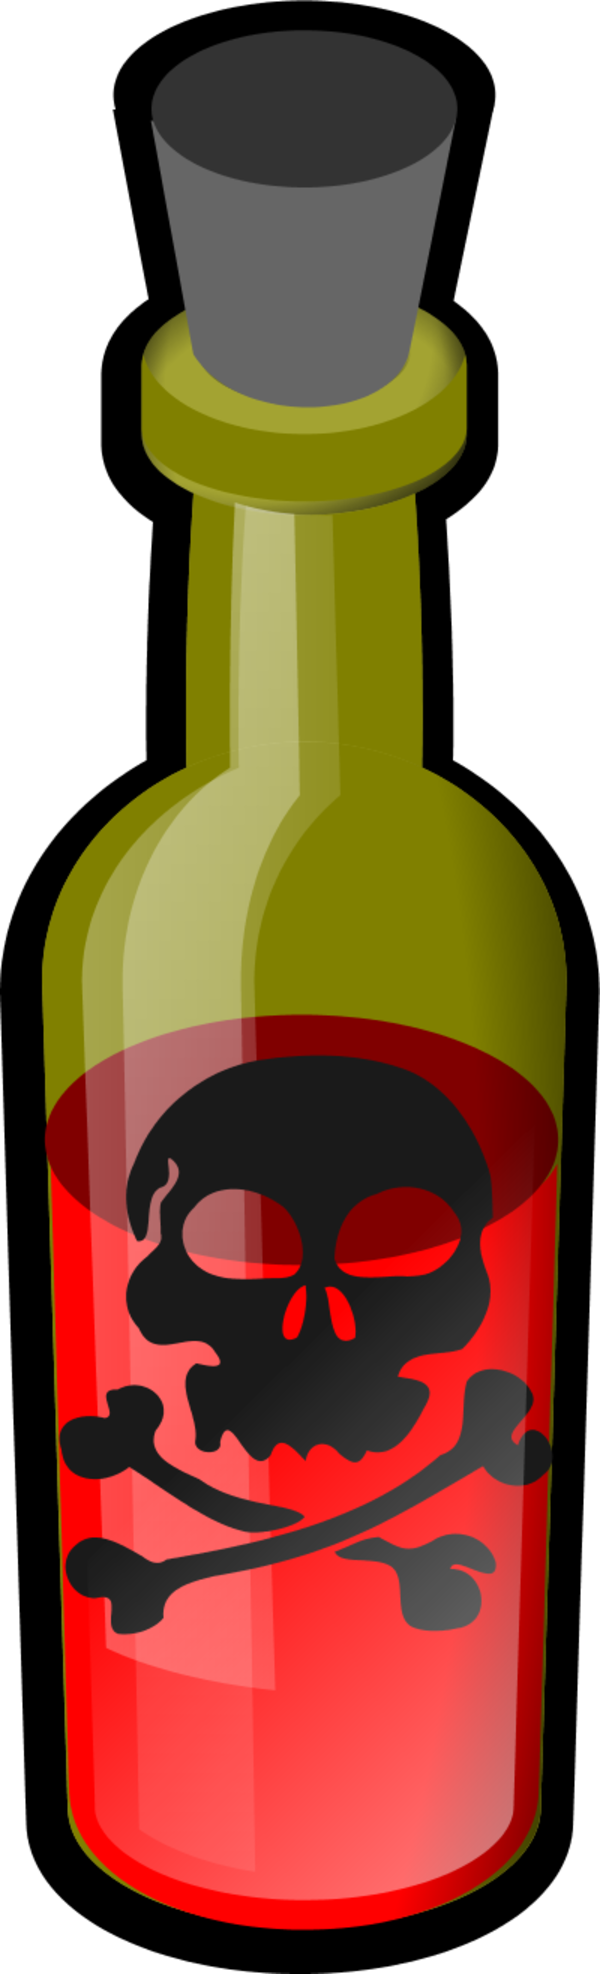 poison clipart wine bottle